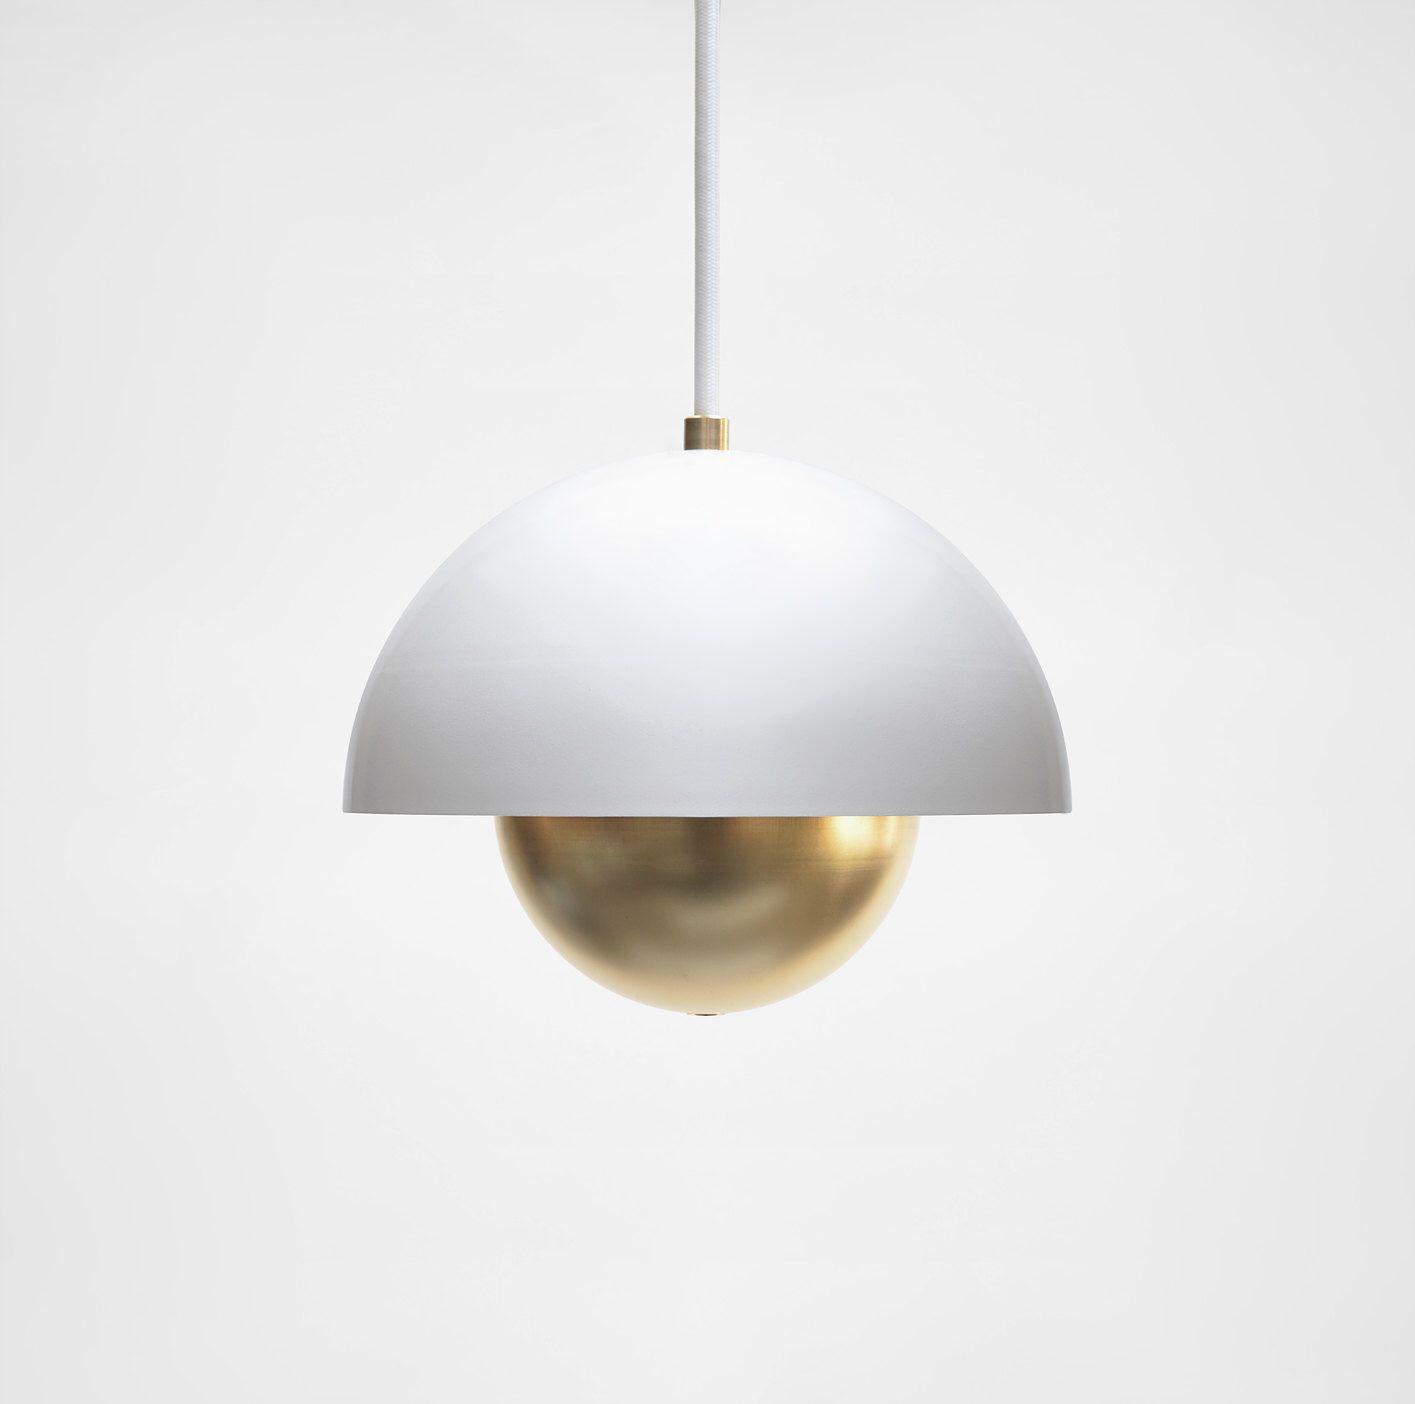 mid century pendant lighting. Modern Pendant Light - Mid Century Minimal Lamp Brass Lighting P